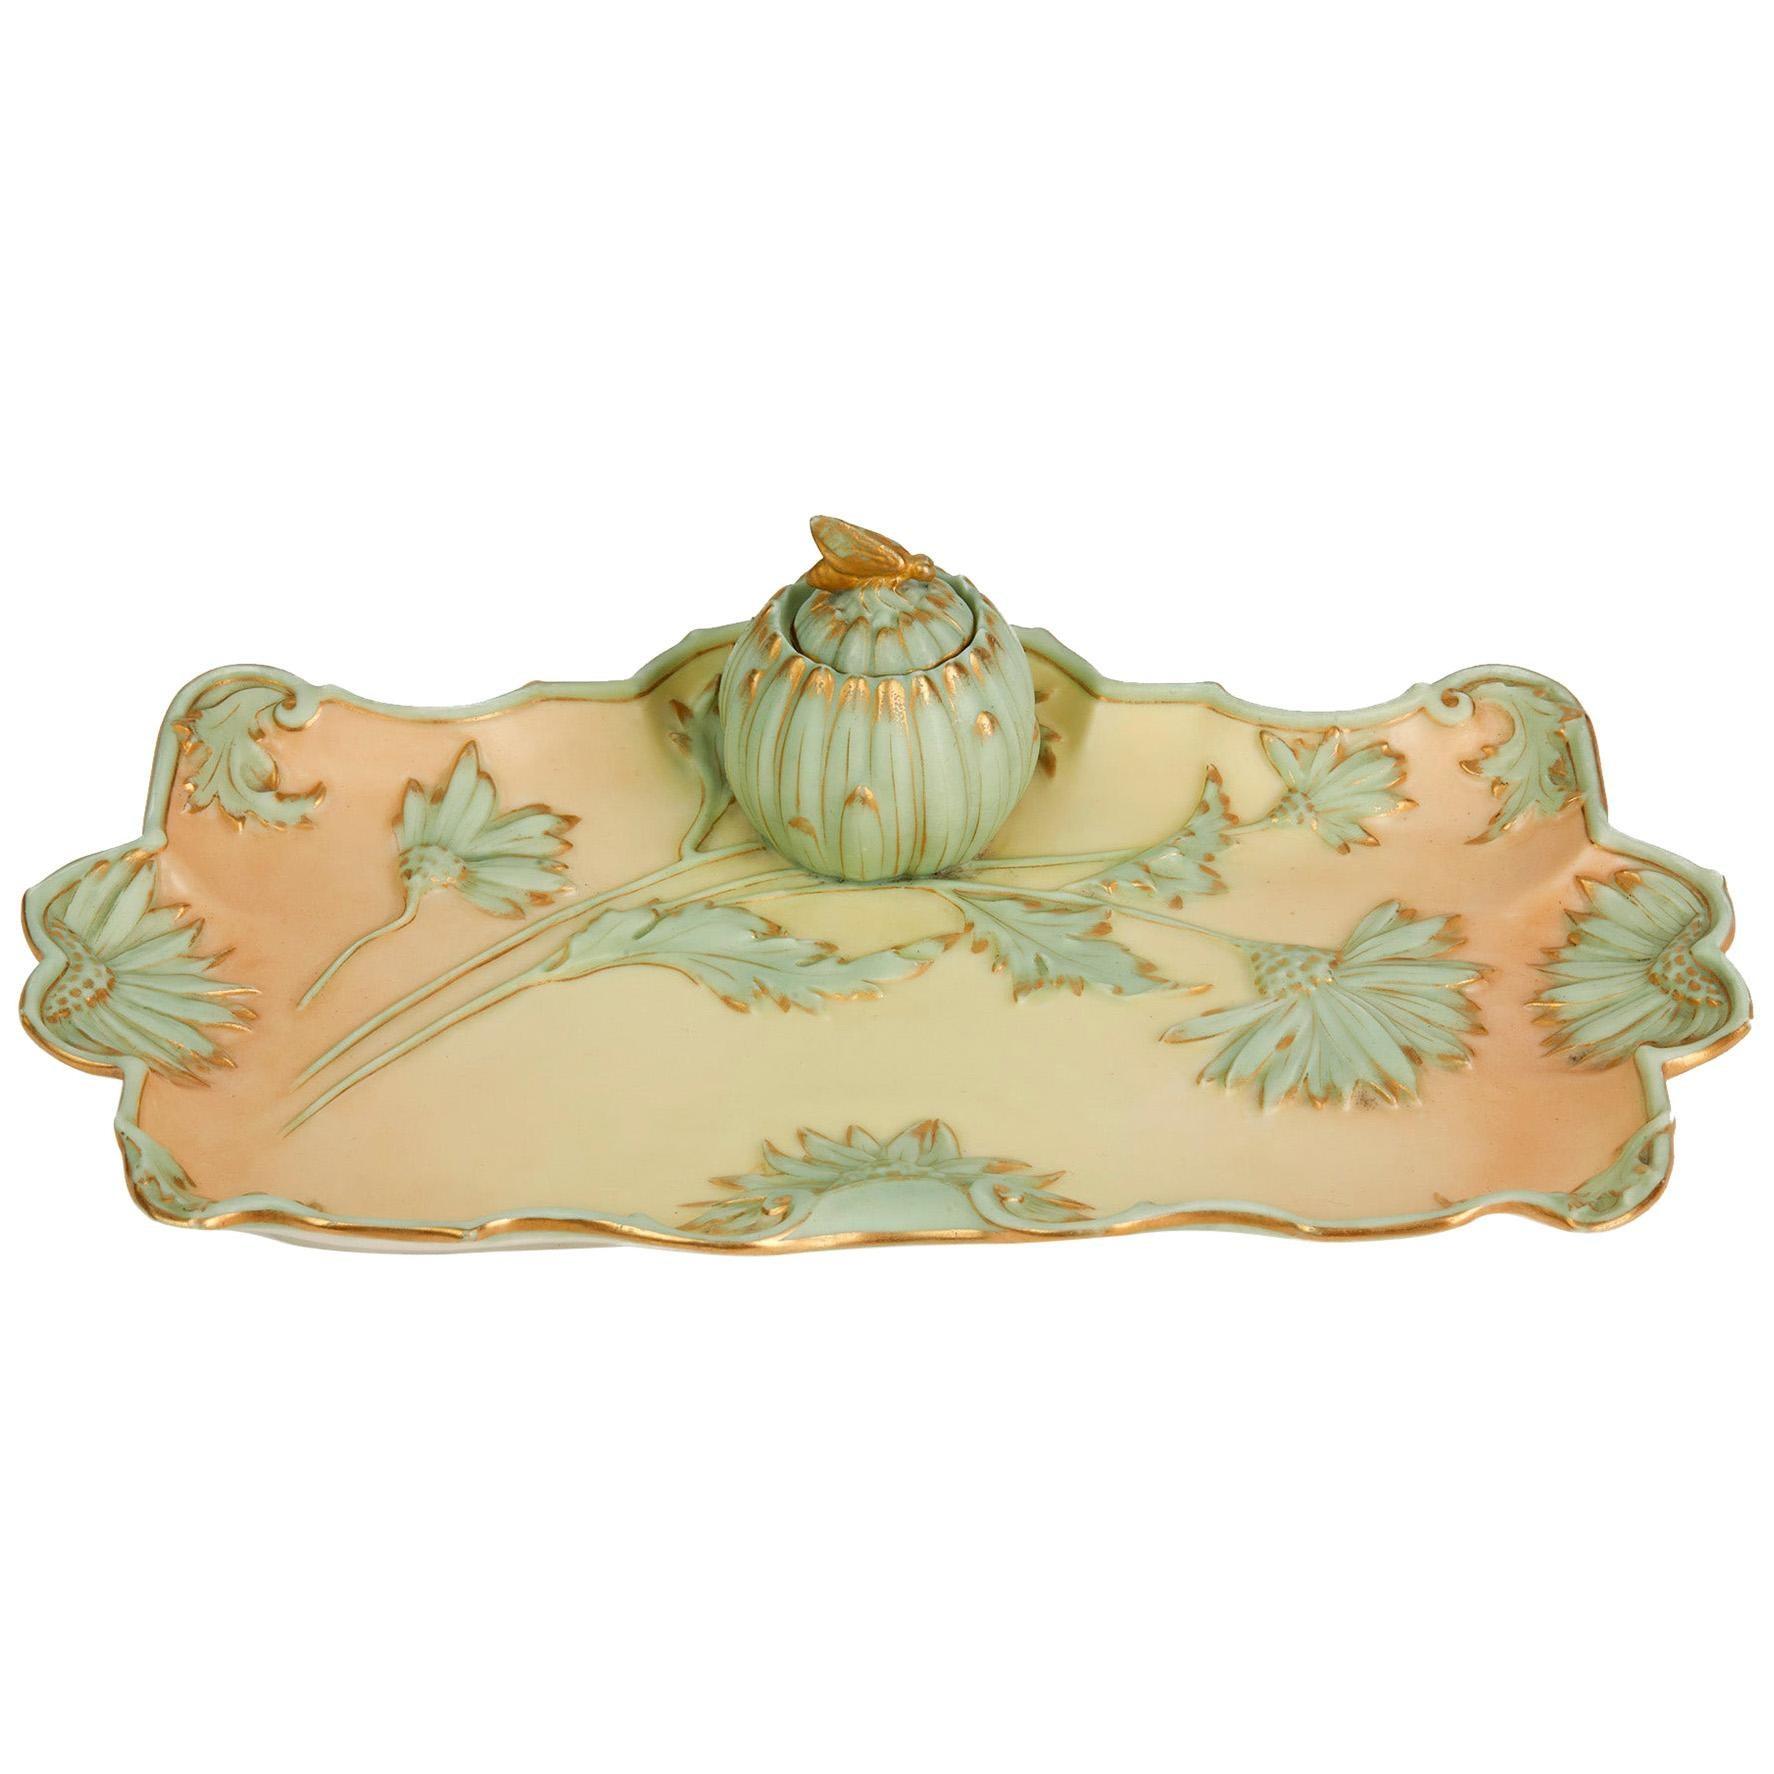 Royal Worcester Art Nouveau Blush Porcelain Desk Stand Dated 1894